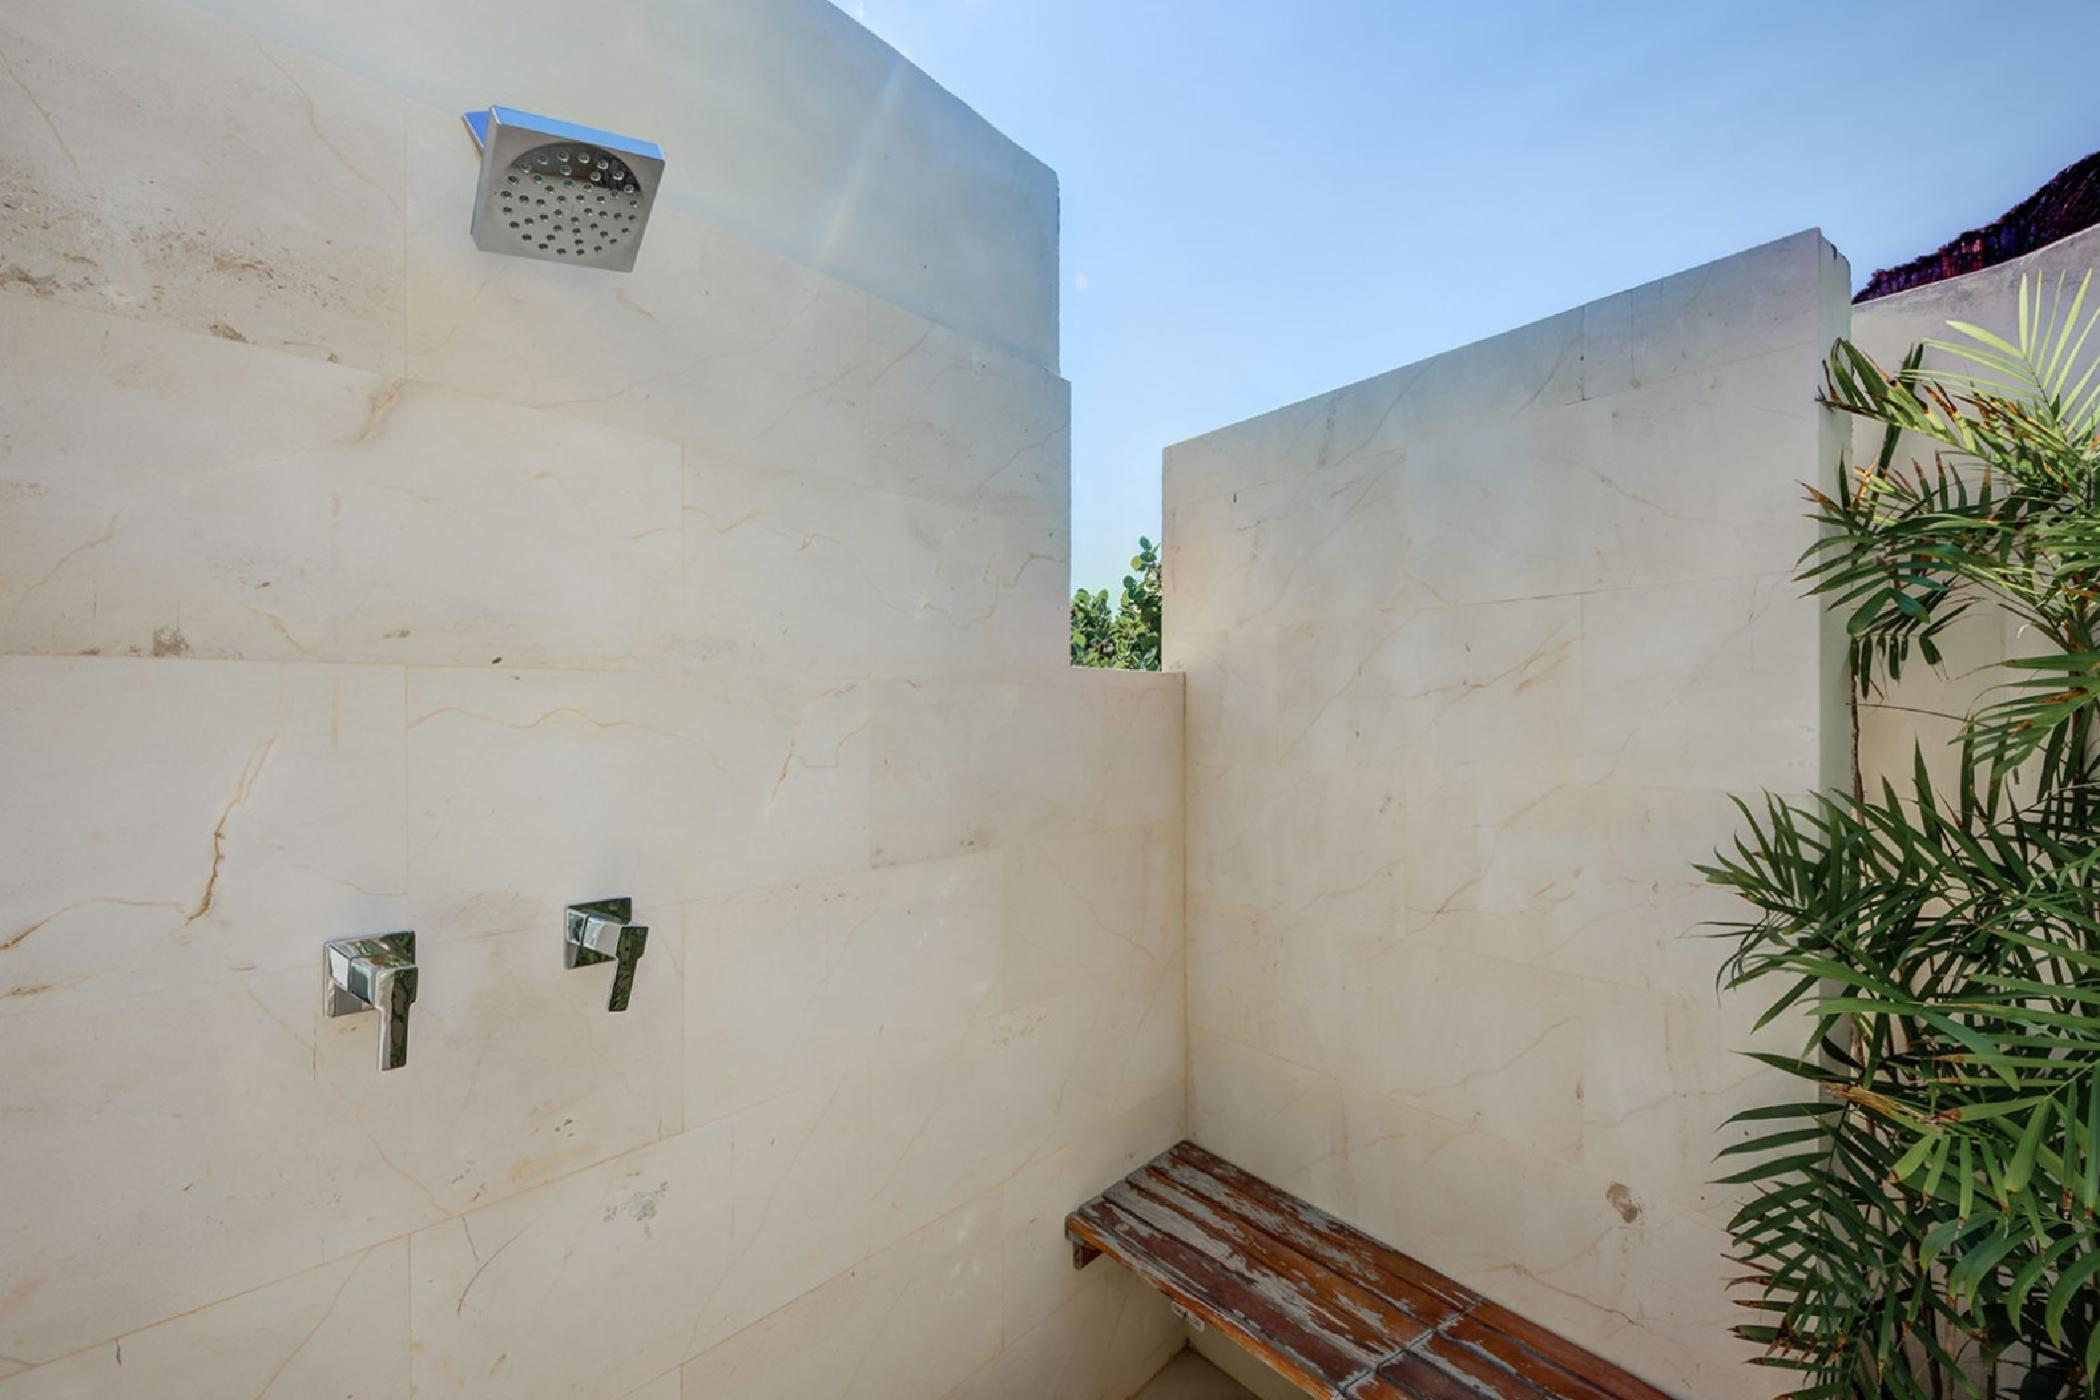 Maya_Luxe_Riviera_Maya_Luxury_Villas_Experiences_Puerto_Aventuras_5_Bedrooms_Zacil_Na_21.jpg